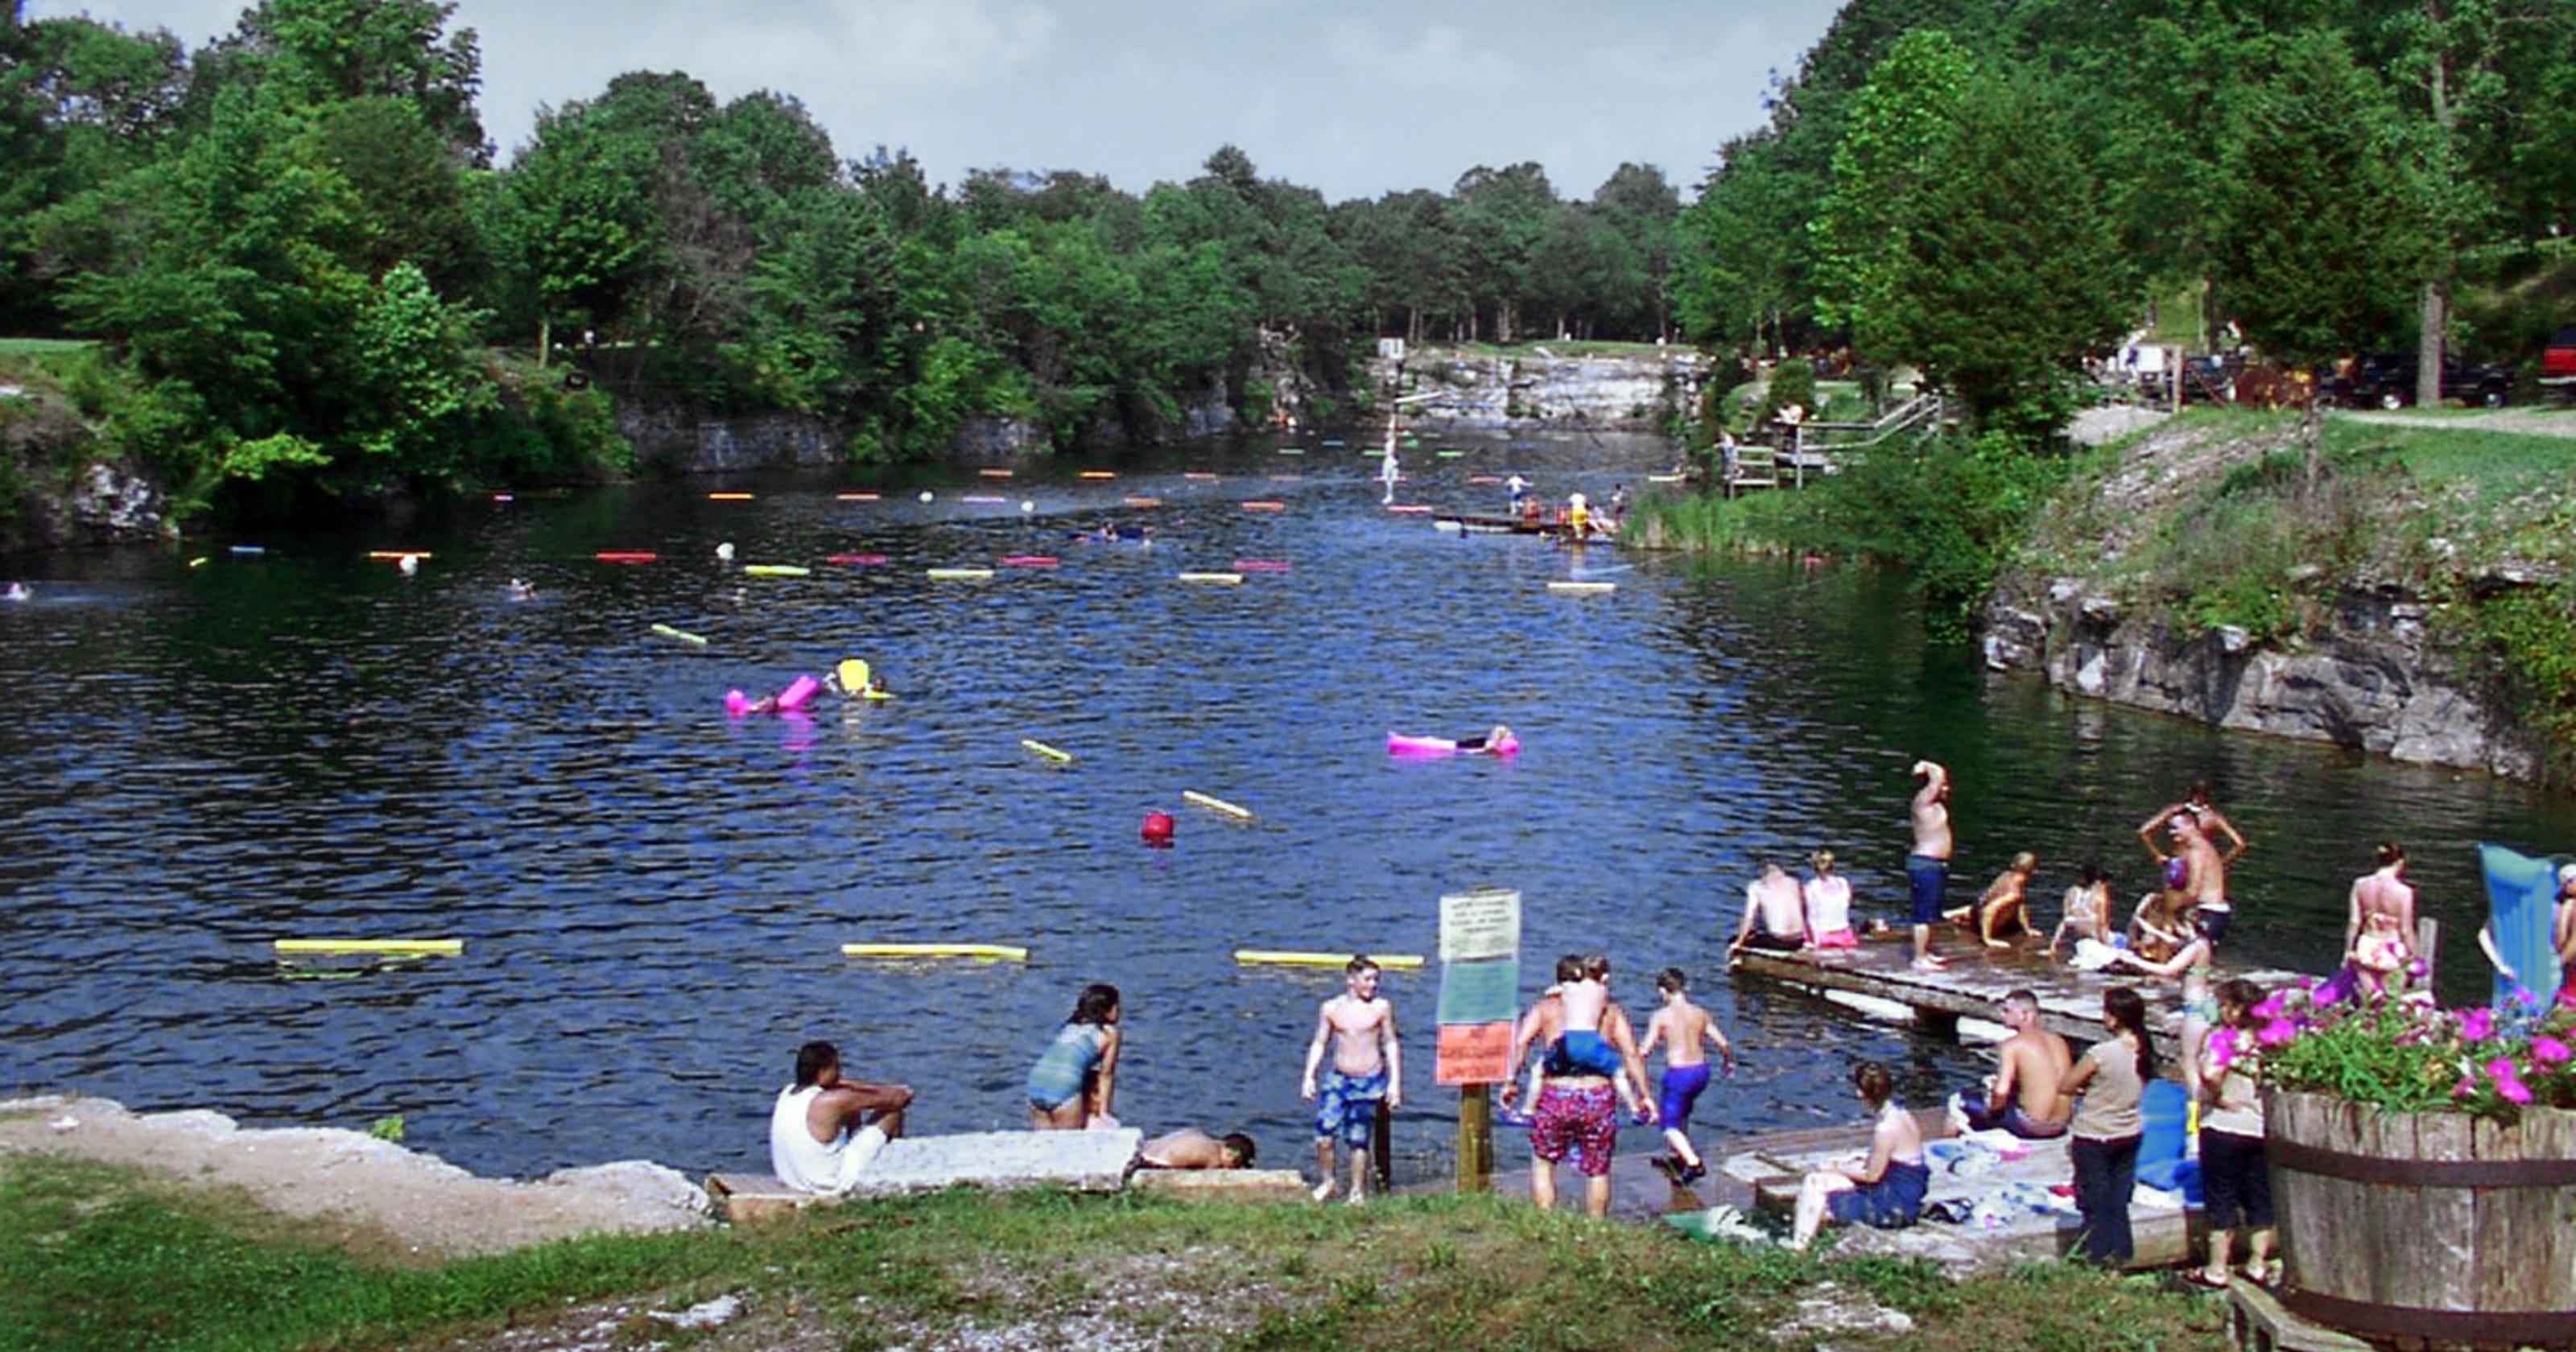 Cincinnati man dies while jumping into water at White Rock Park